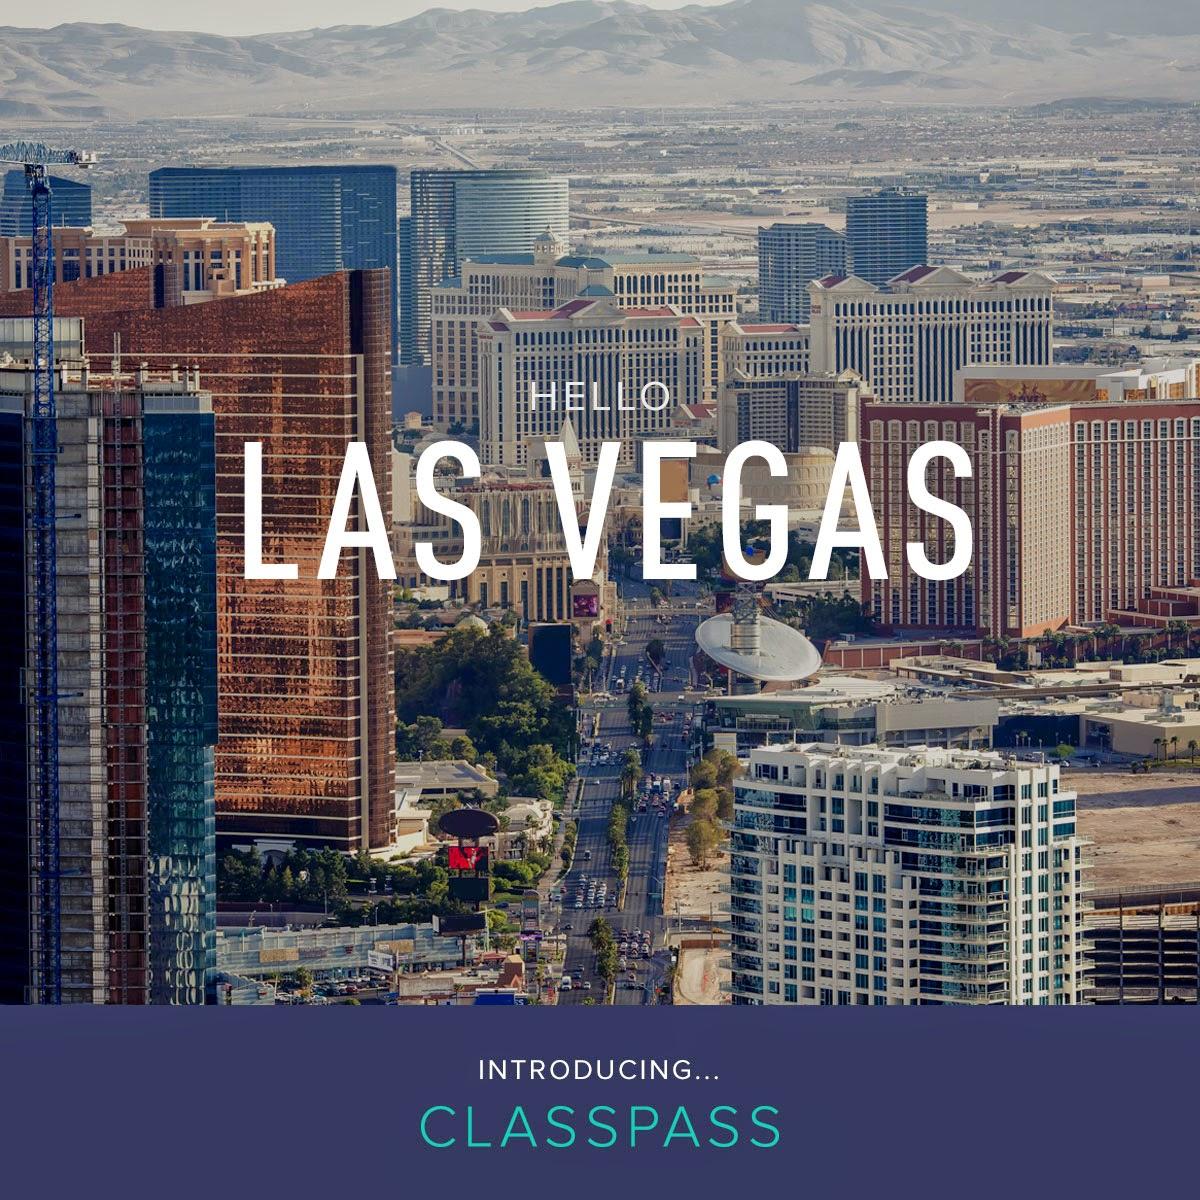 Hello, Las Vegas. Introducing... ClassPass